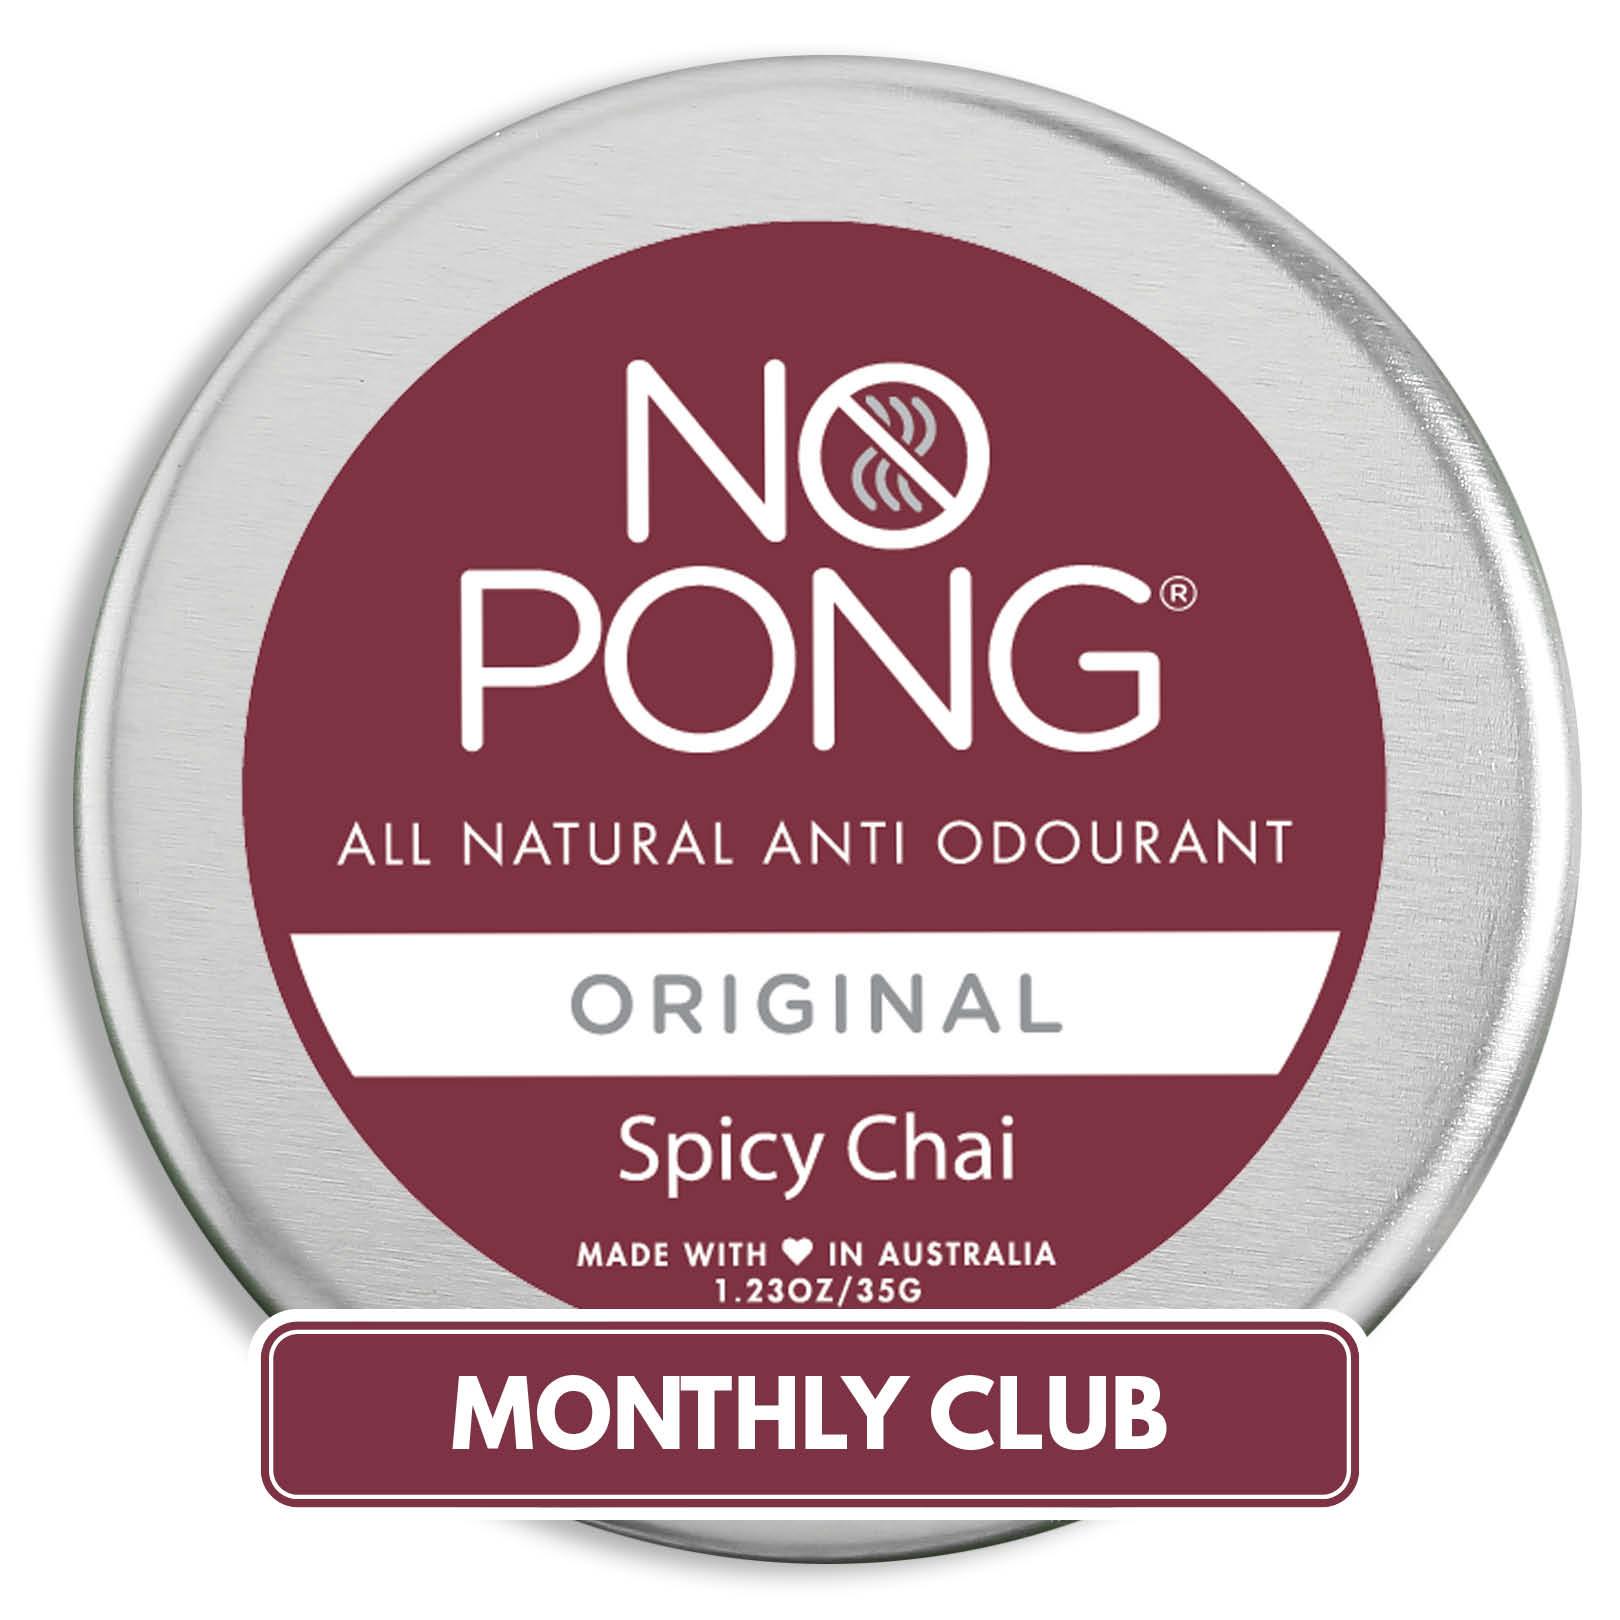 SPICY CHAI ORIGINAL